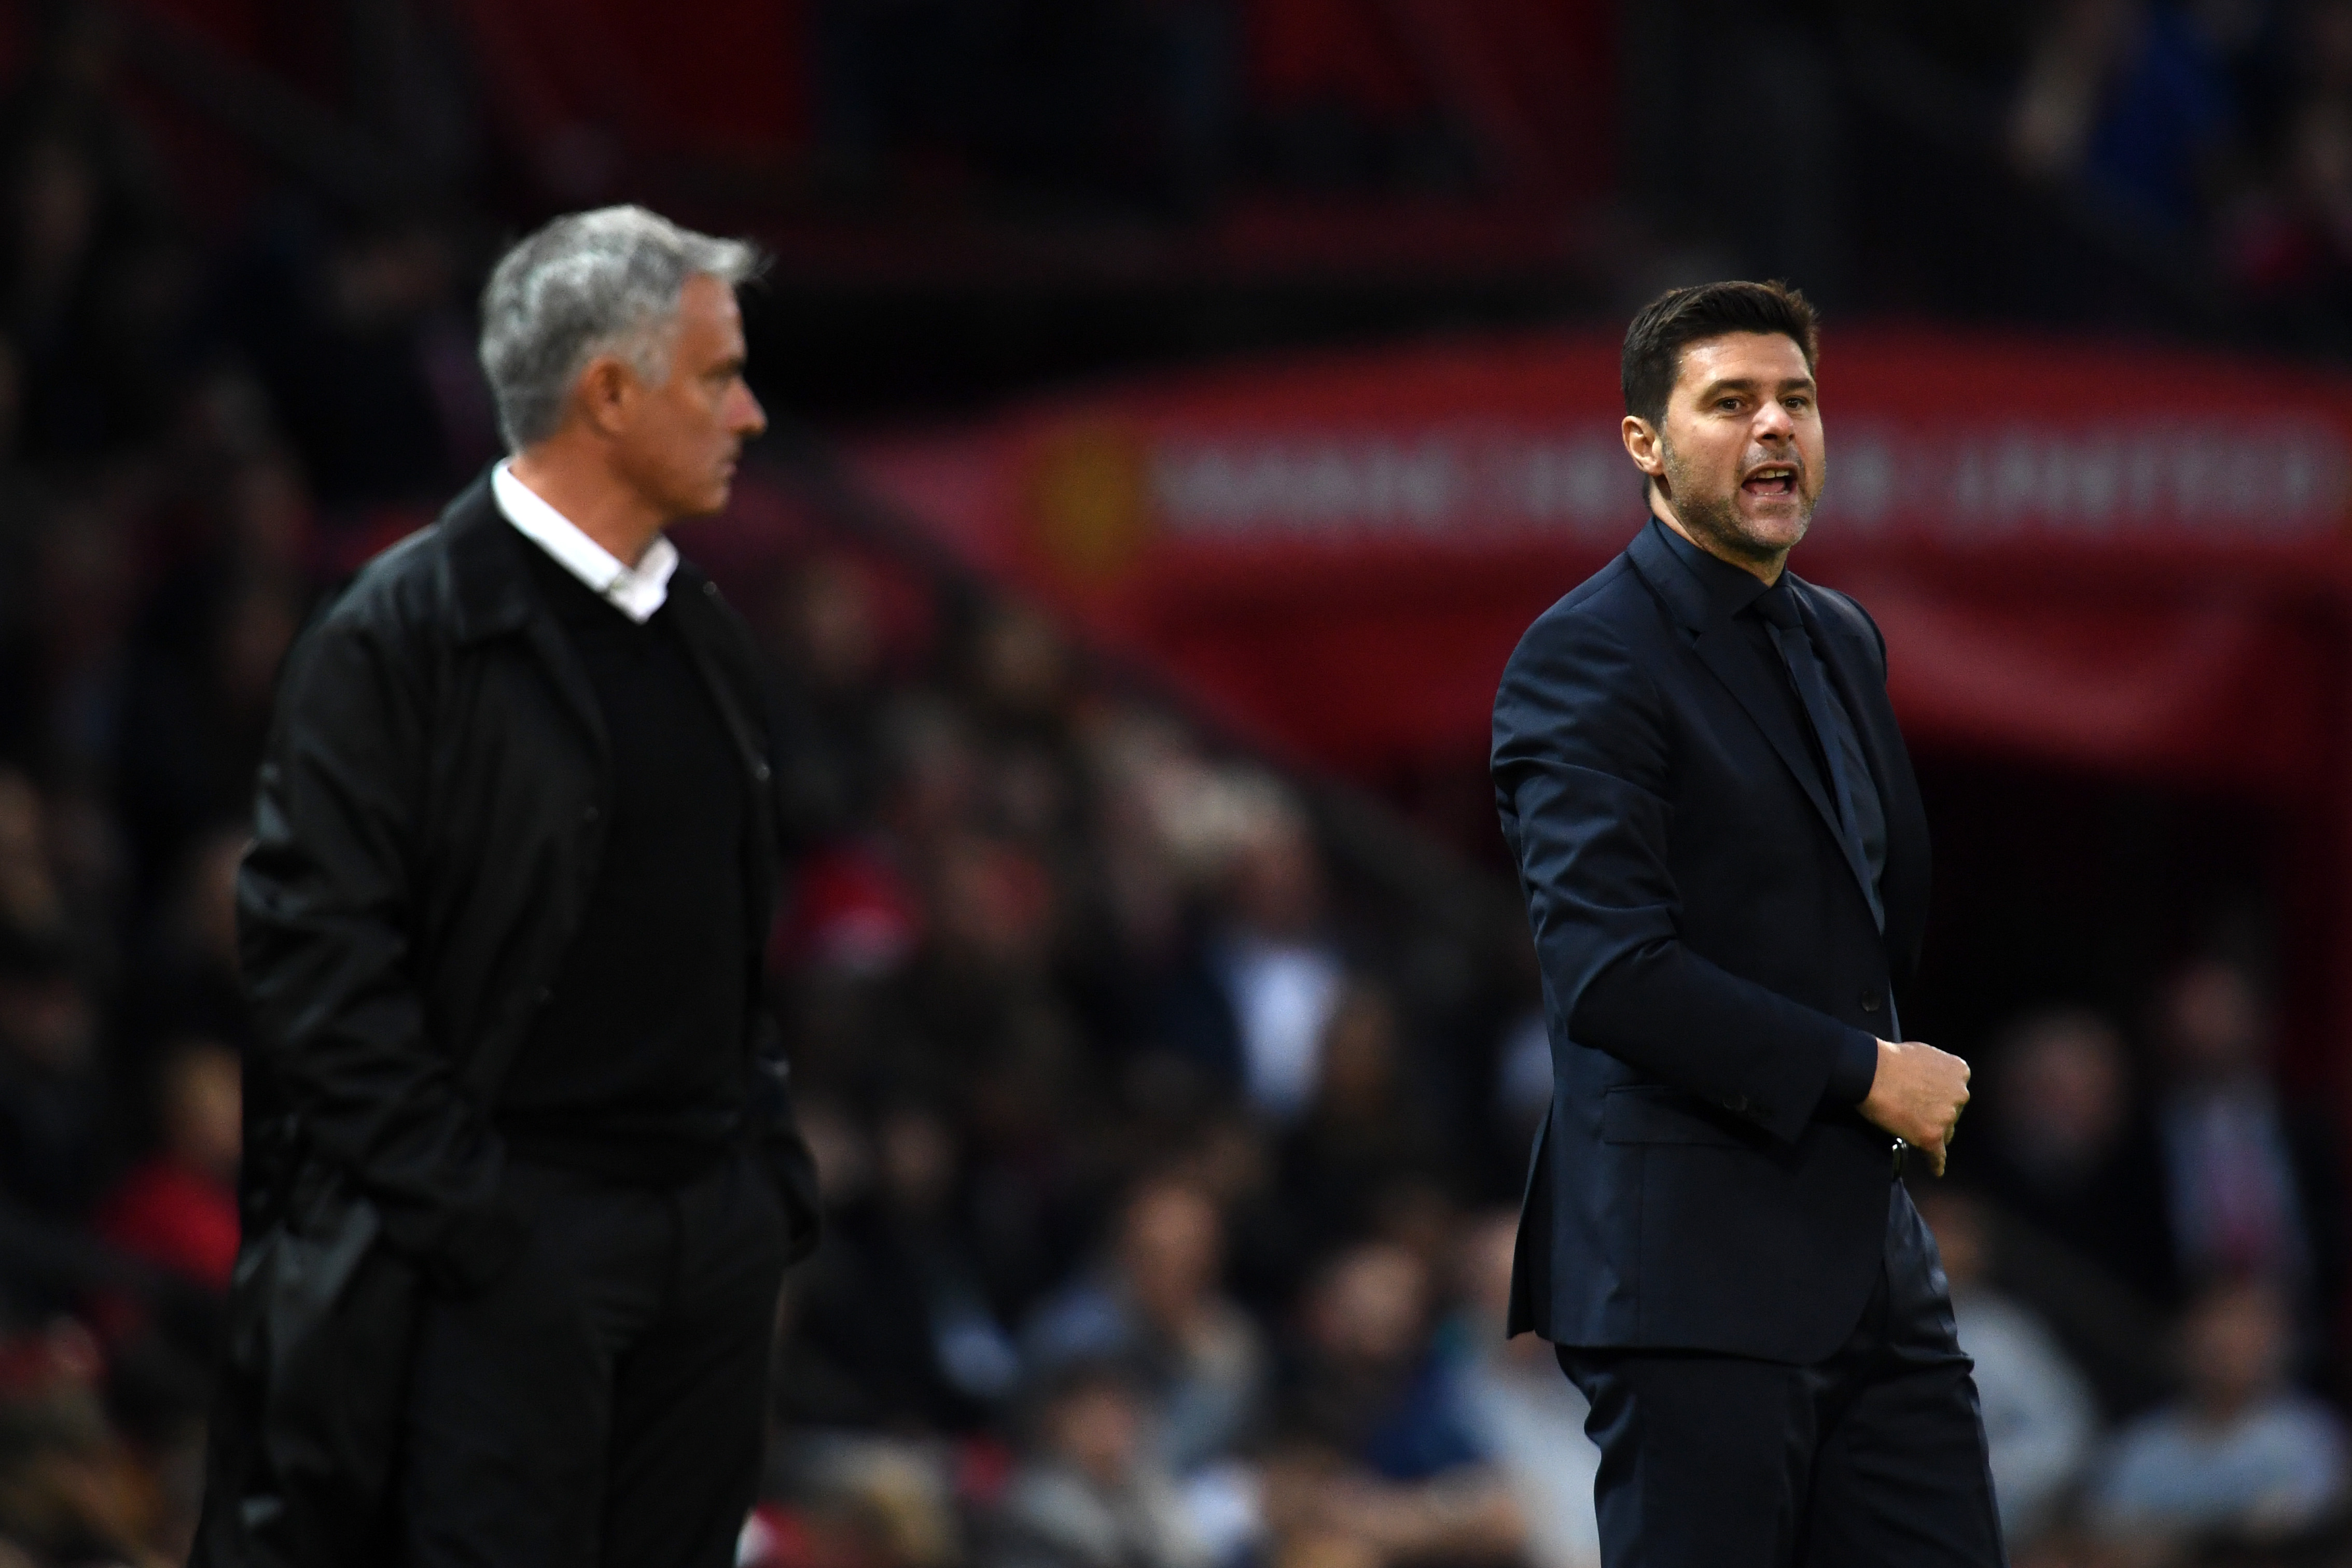 José Mourinho & Mauricio Pochettino - Manchester United v Tottenham Hotspur